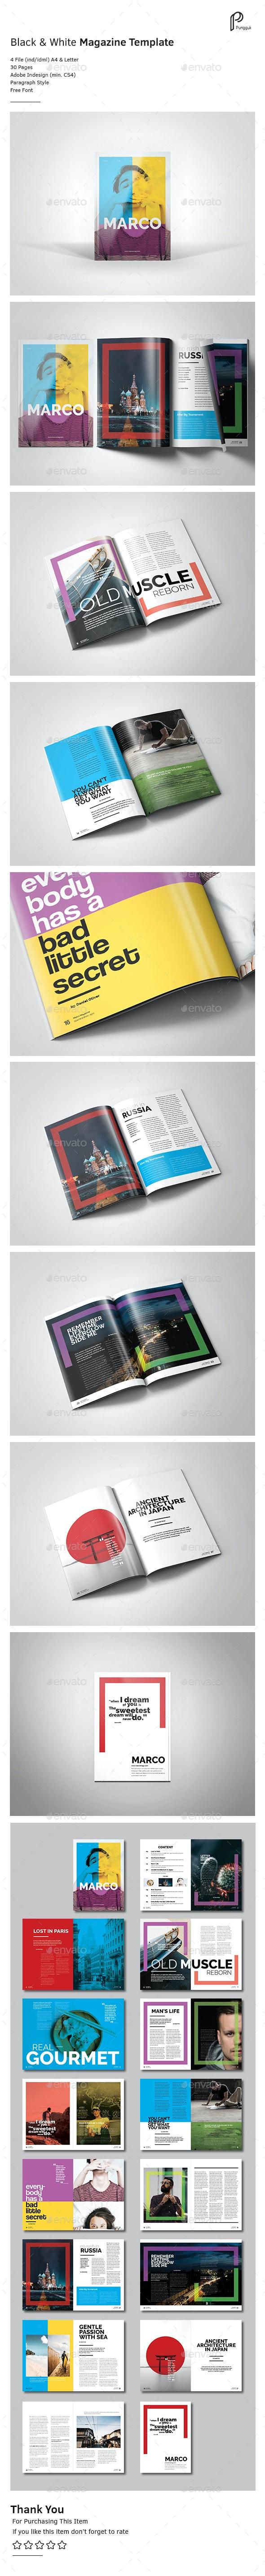 Catchy Magazine Vol.6 - Magazines Print Templates